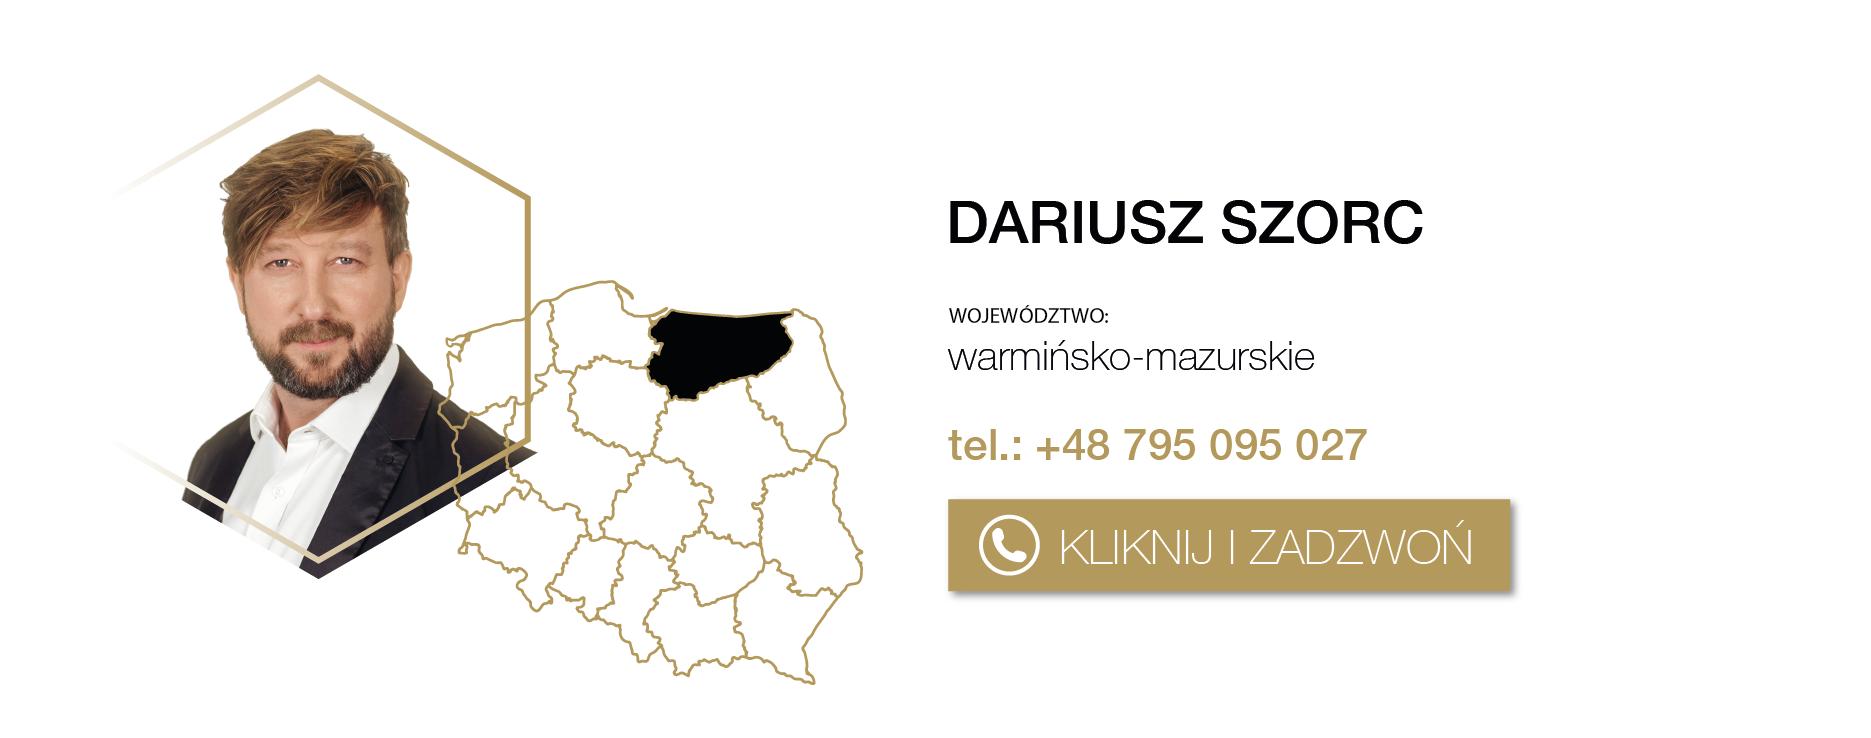 Dariusz Szorc